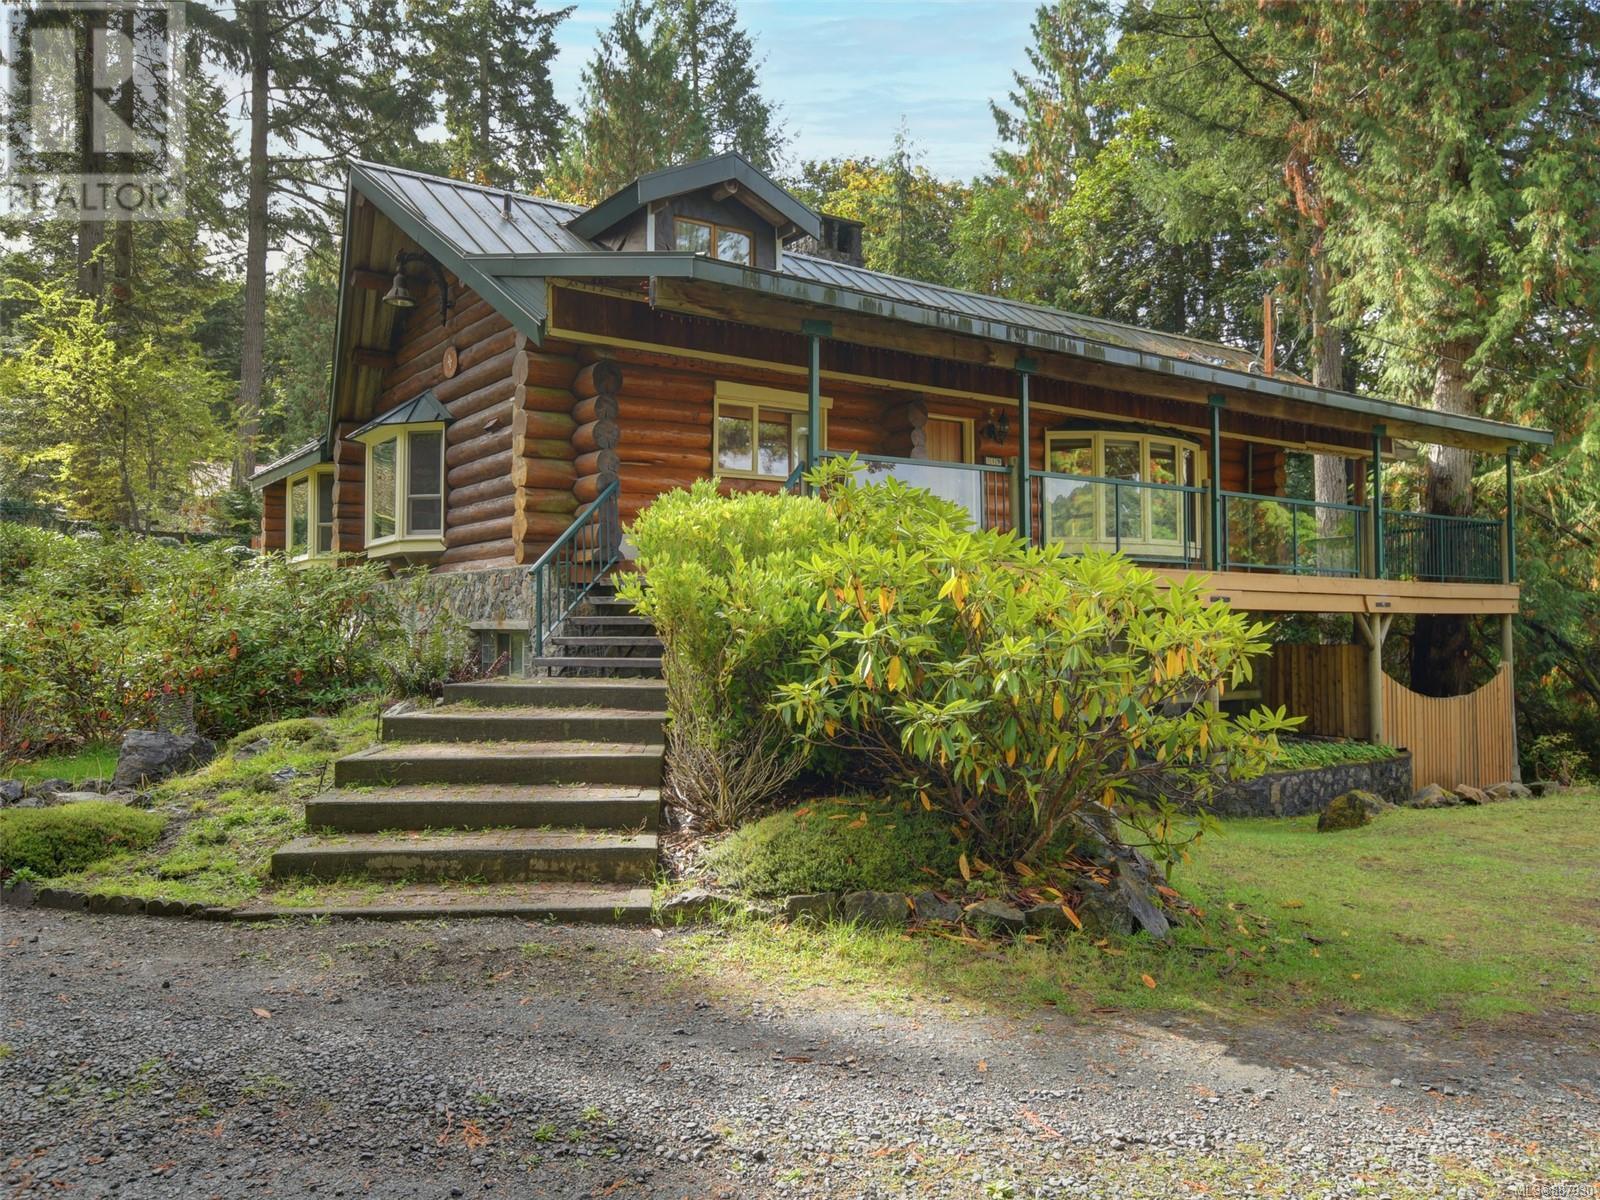 119 Ross-Durrance RdHighlands, British Columbia  V9V 2A3 - Photo 1 - 887930